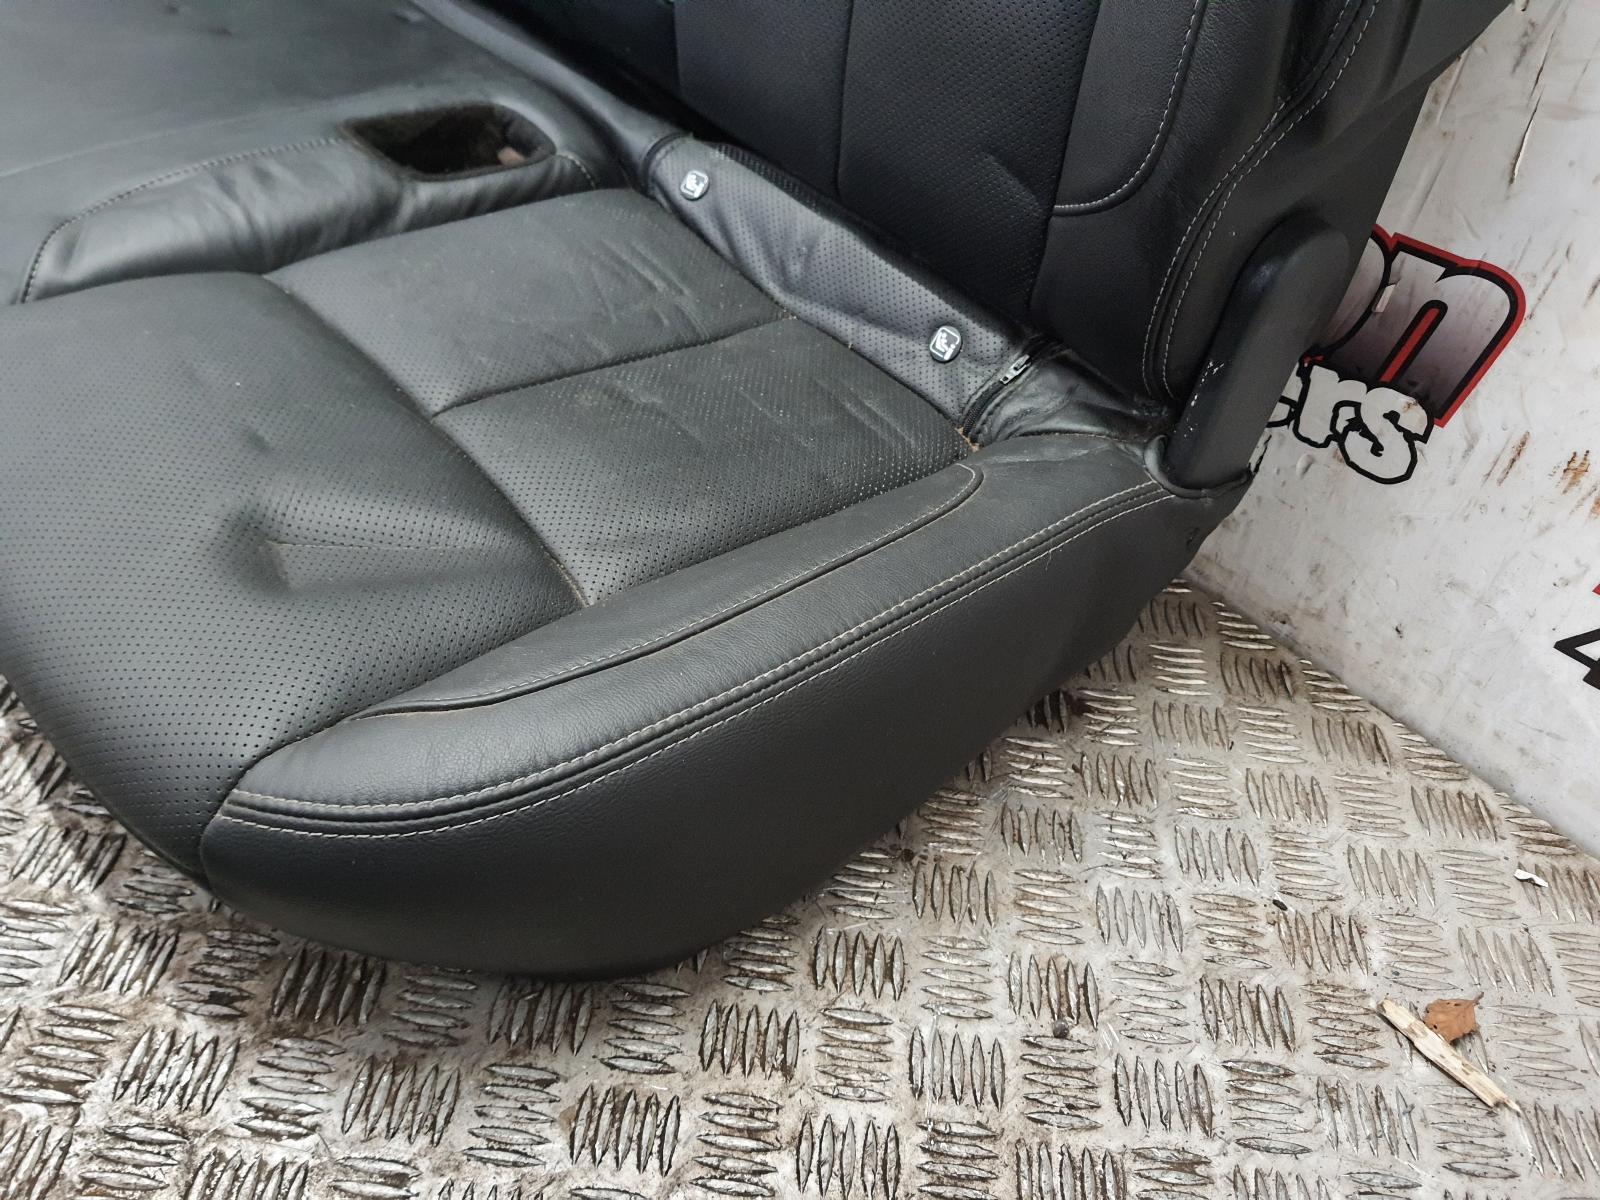 View Auto part 2ND_SEAT_REAR_SEAT NISSAN NAVARA 2019